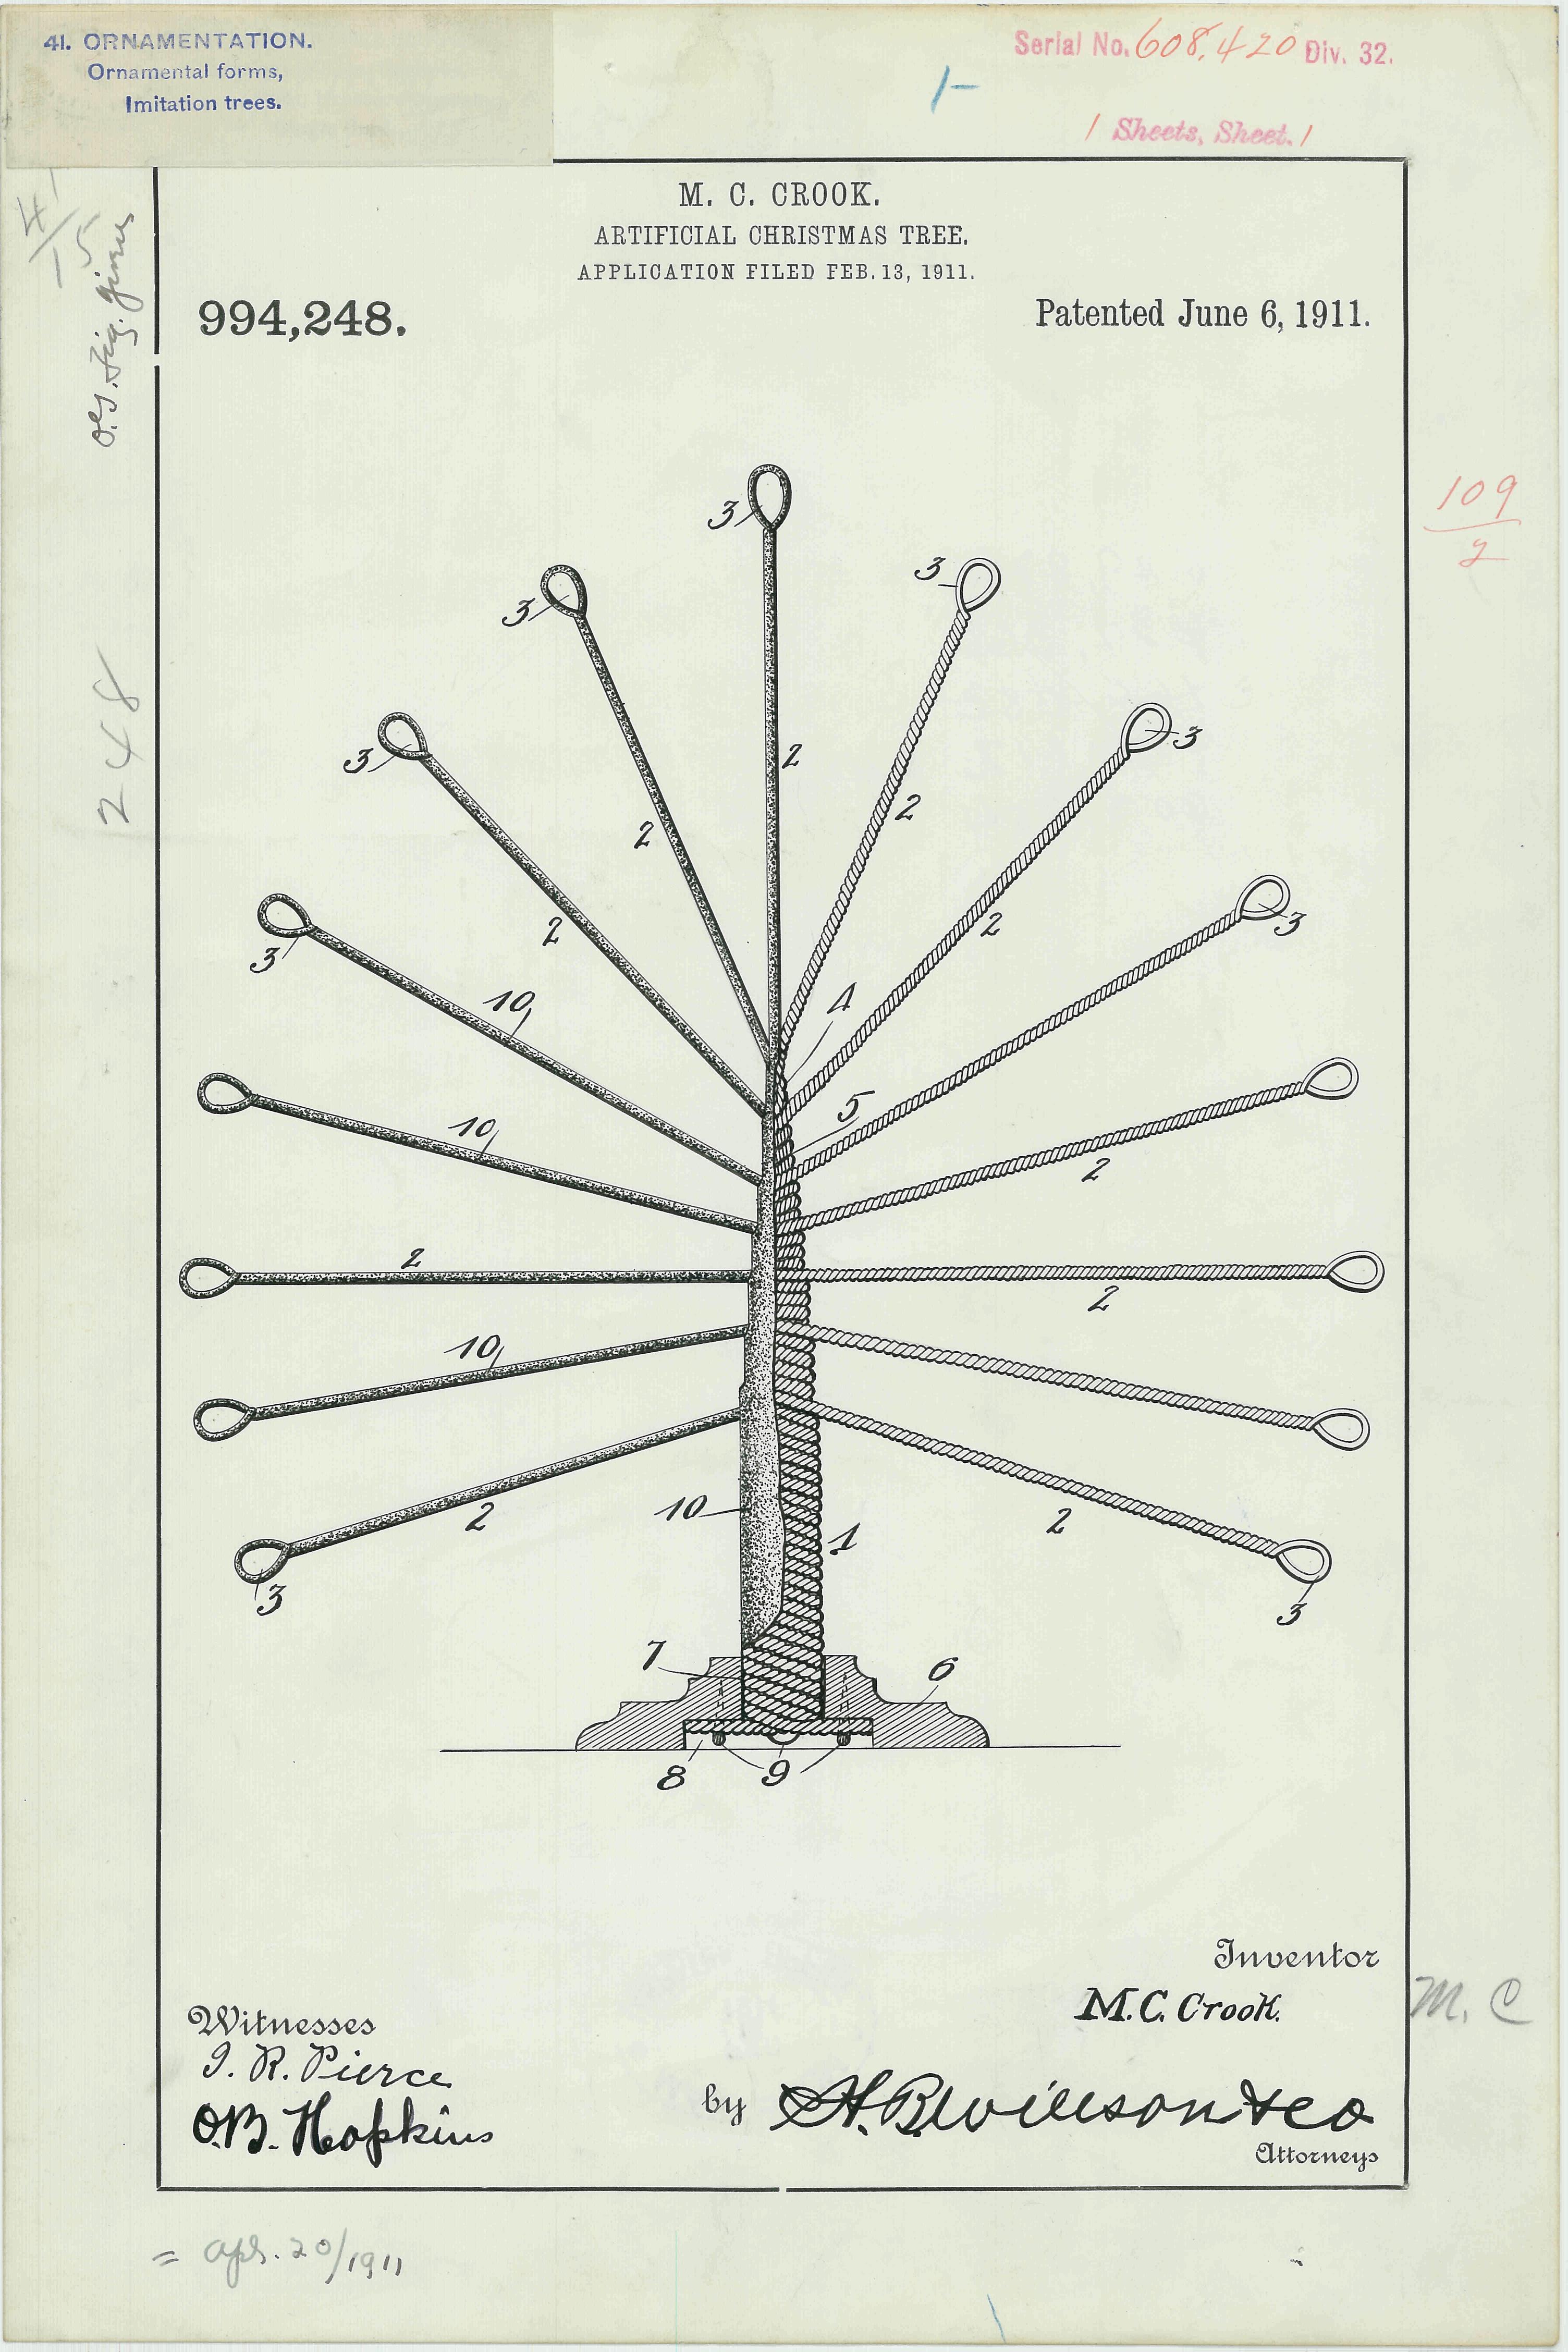 rg-241-utility-patent-drawings-no-994248